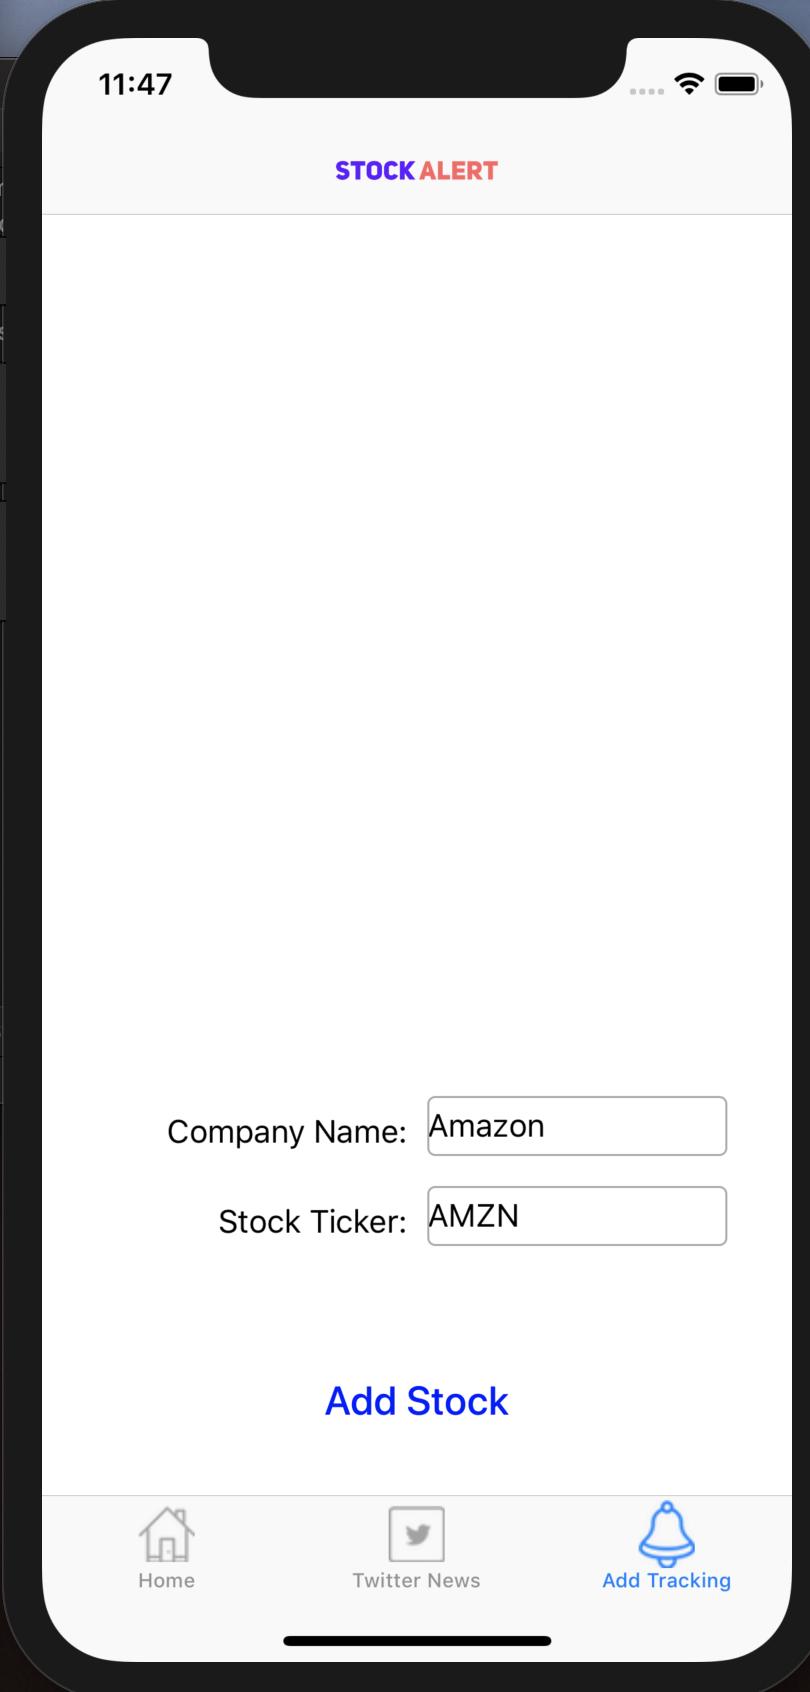 Adding stocks